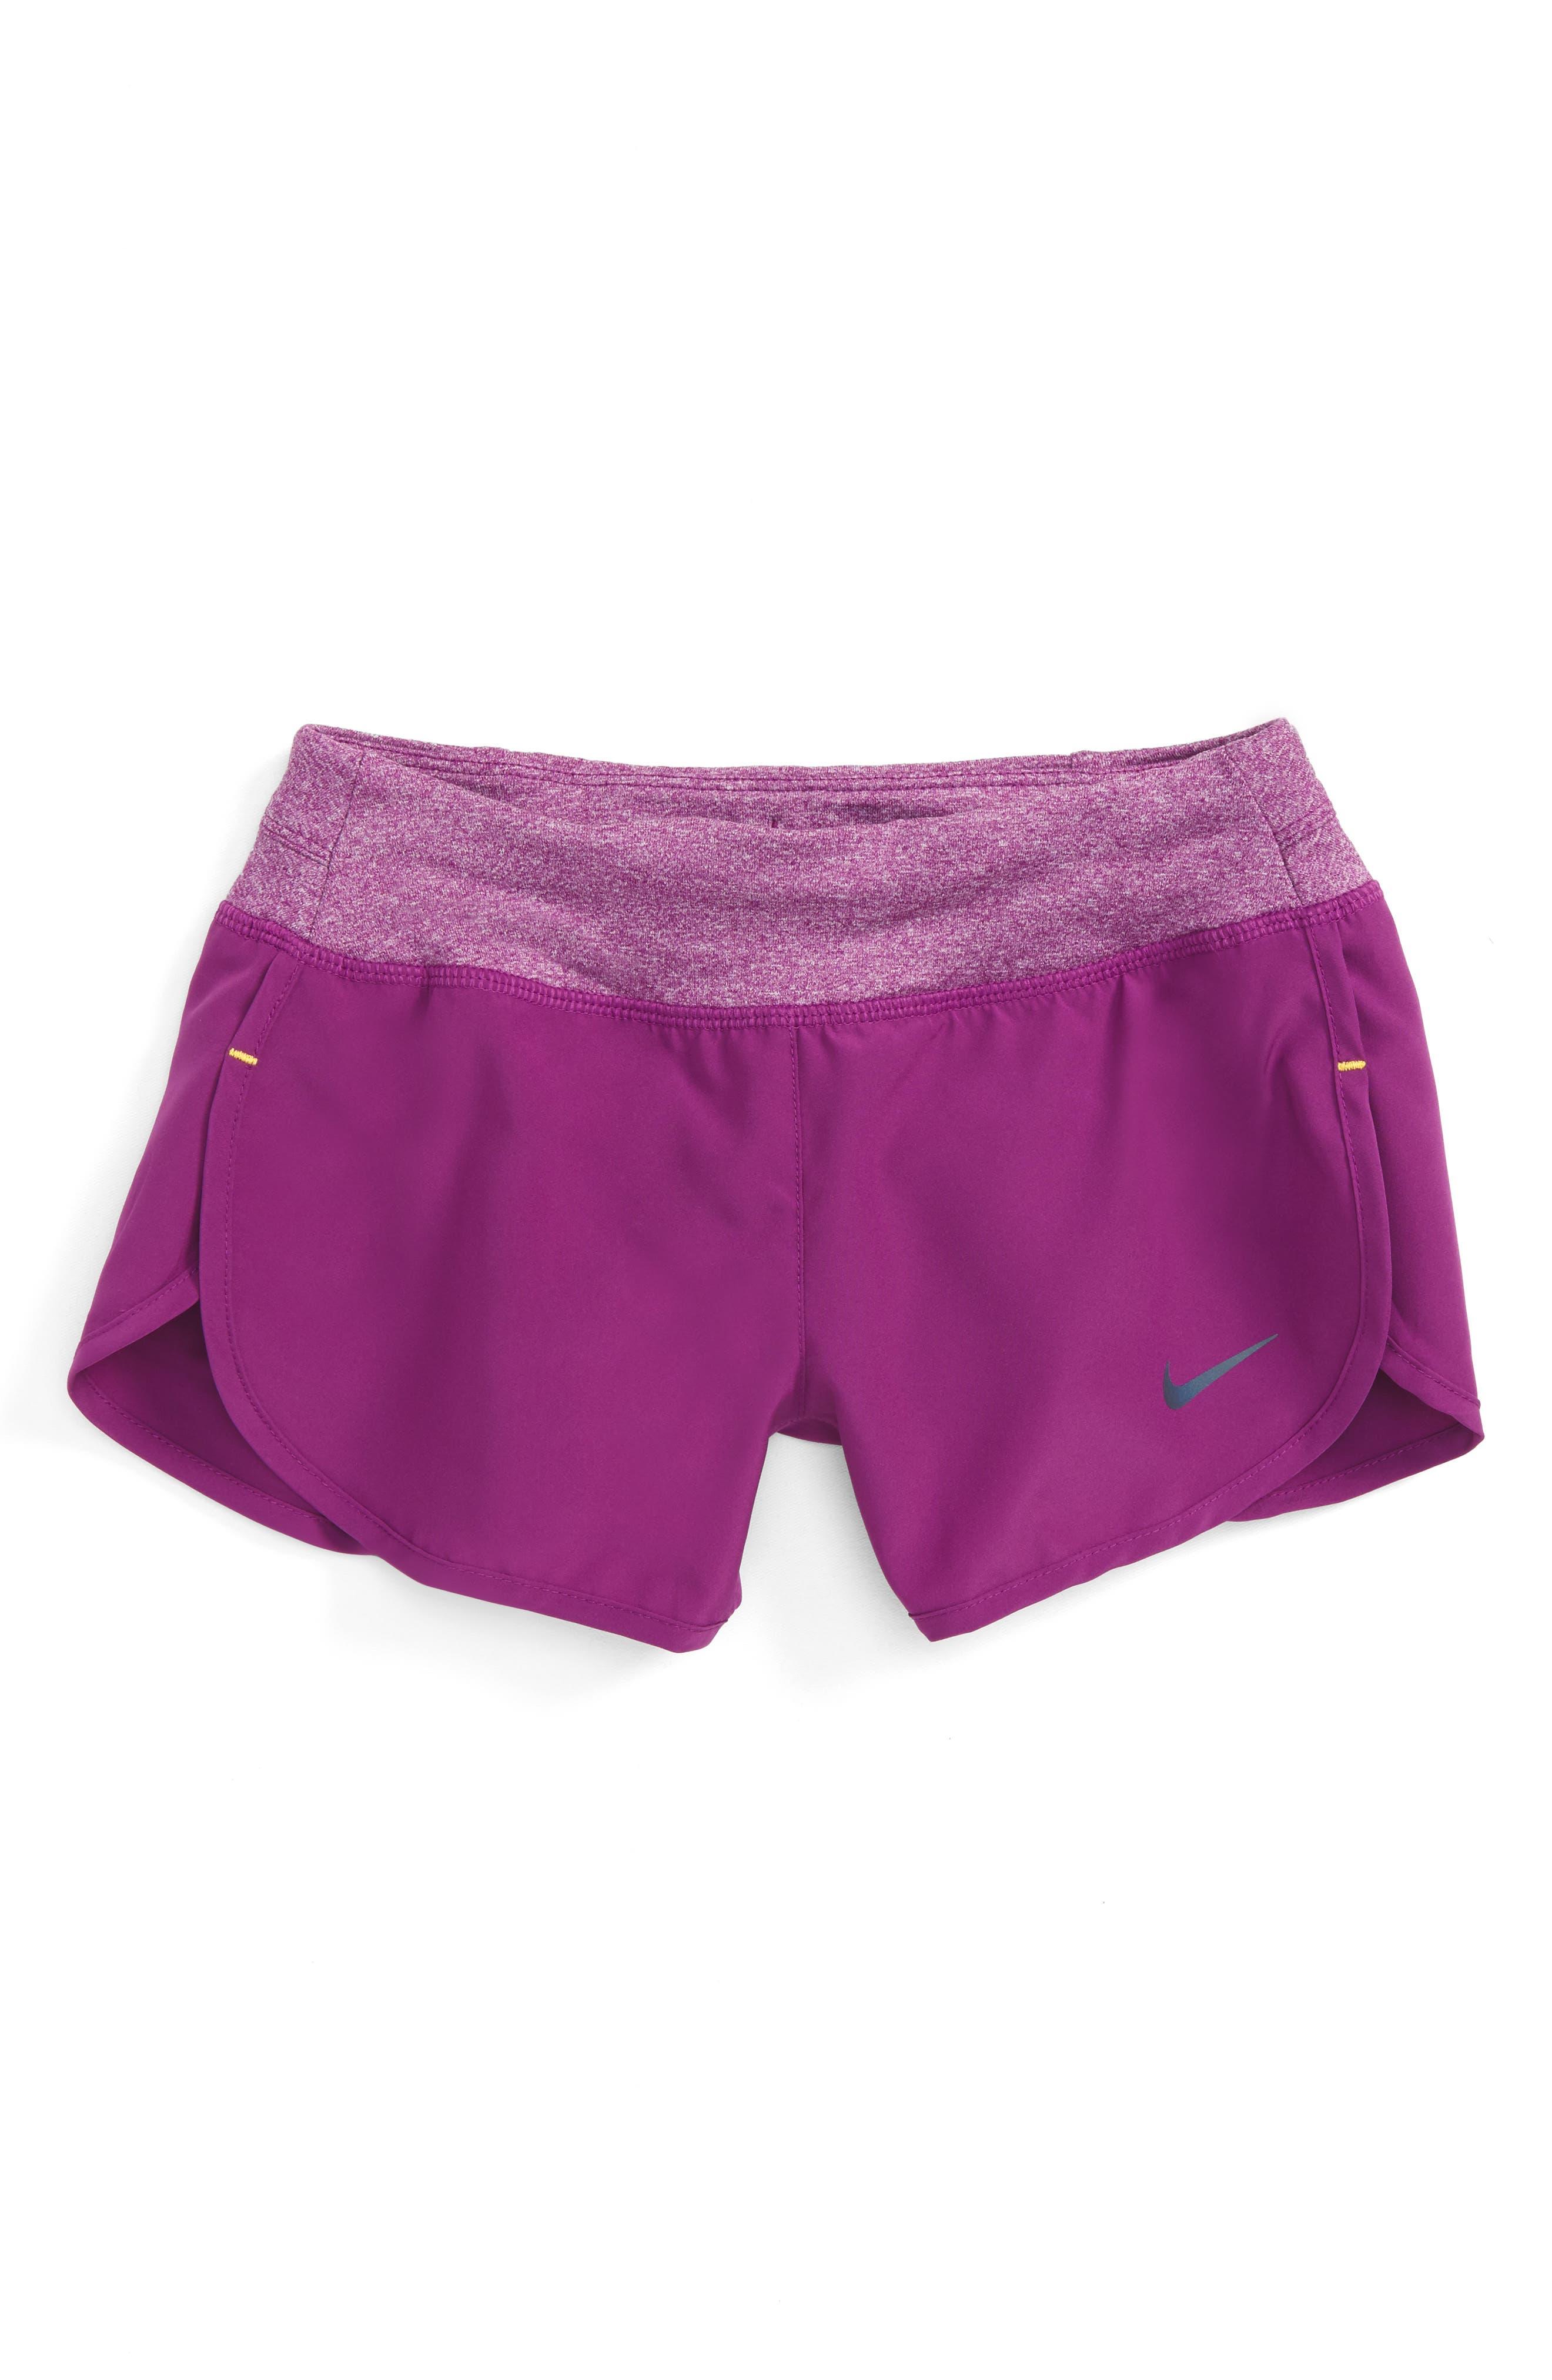 Main Image - Nike 'Rival' Dri-FIT Shorts (Big Girls)